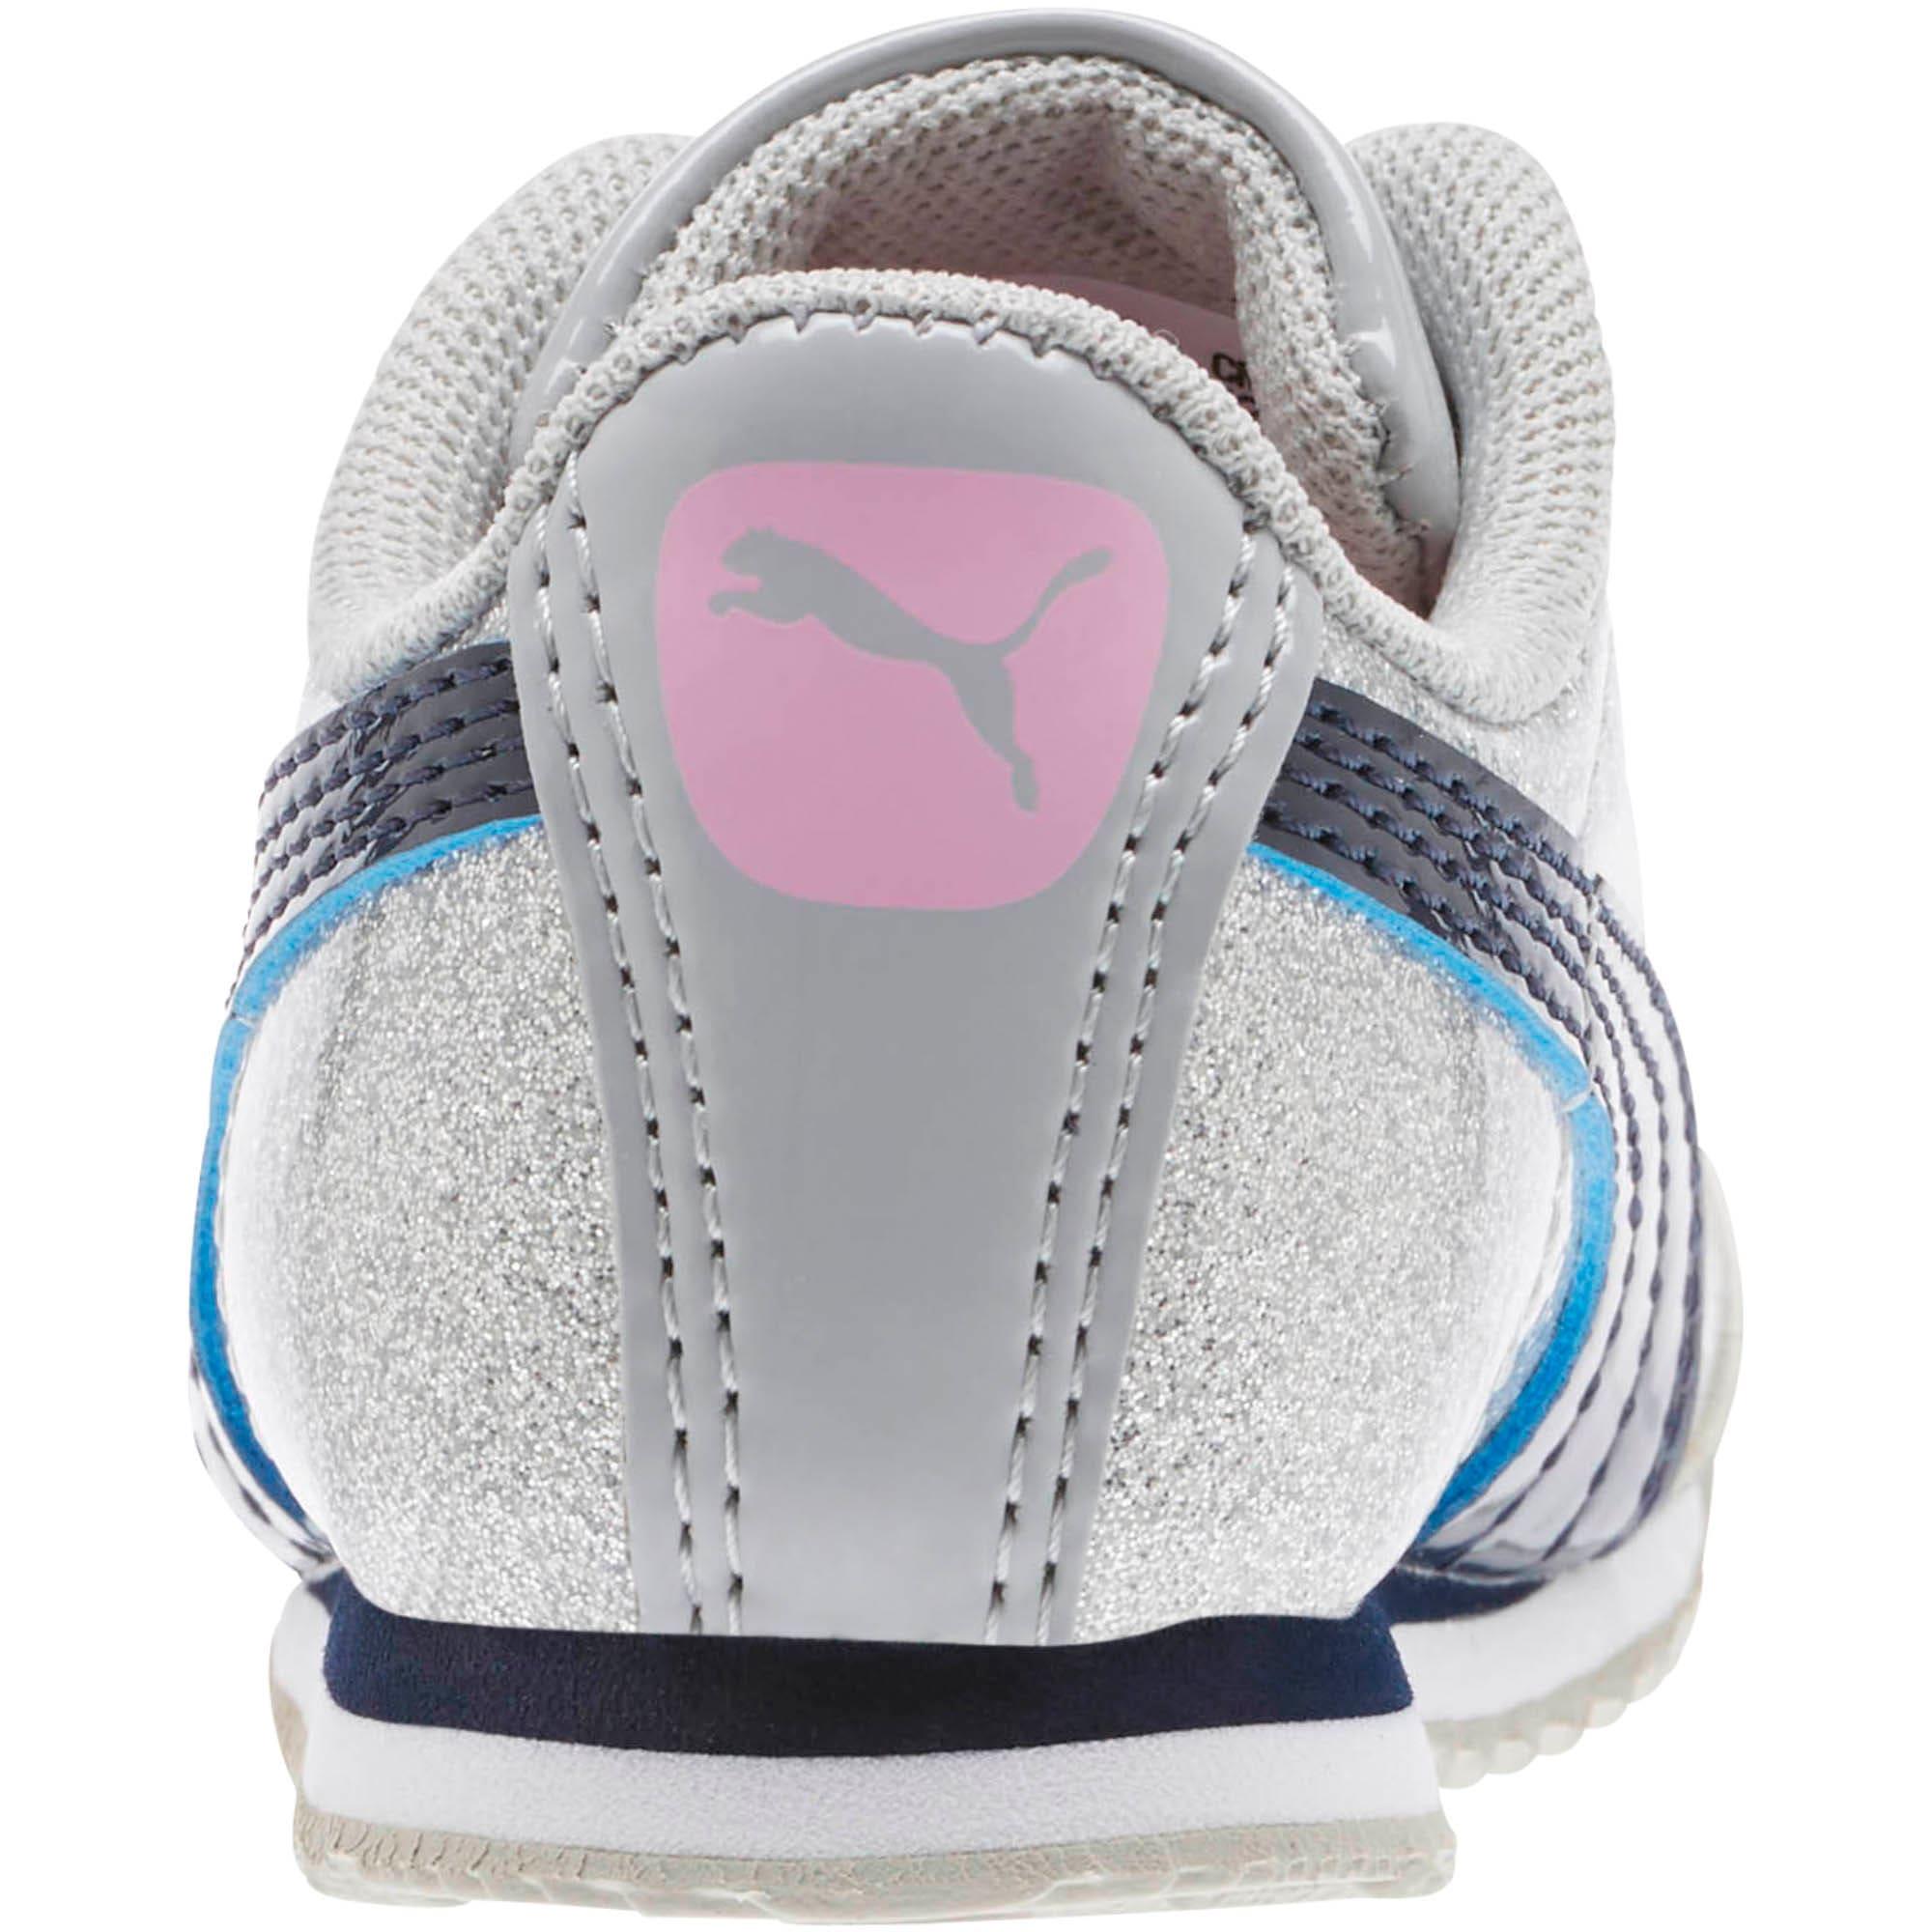 Thumbnail 4 of Roma Glam INF Shoes, Gray Violet-Peacoat, medium